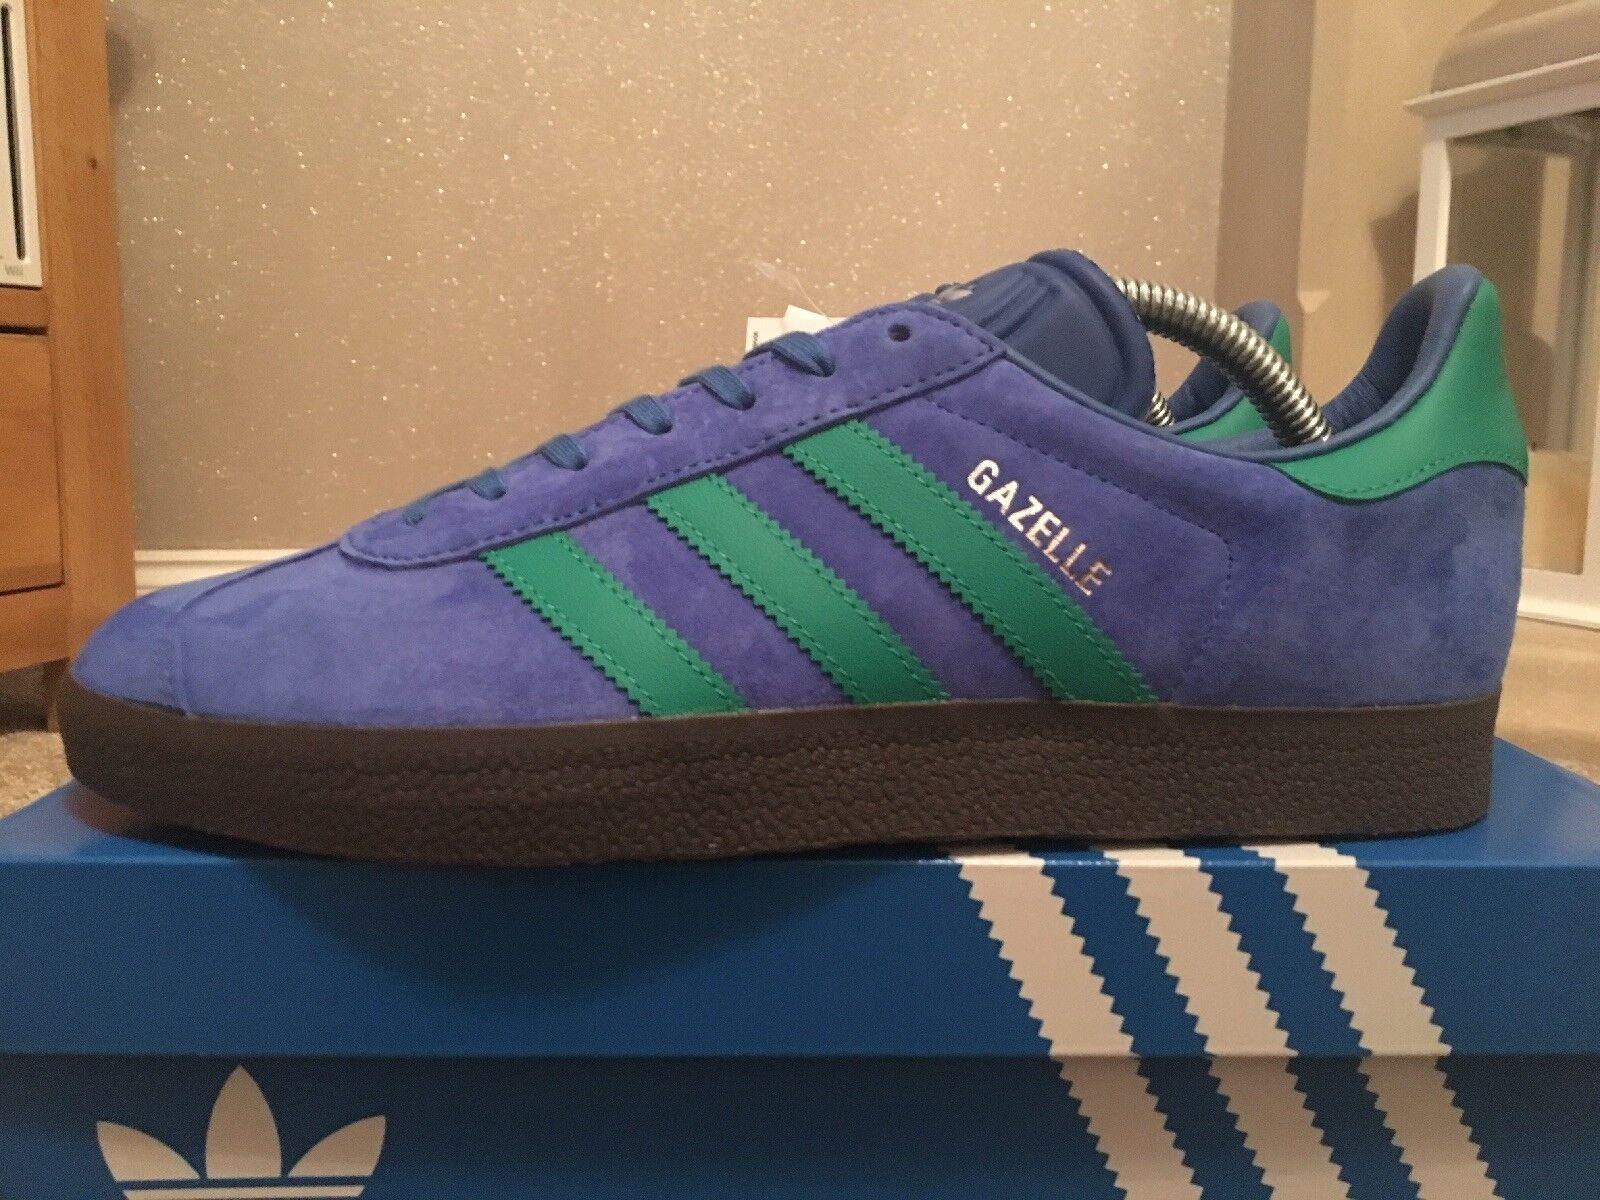 Retro Adidas Gazelle bleu vert gomme MALMO SUEDE 80 S Football Casuals Taille 8 Entièrement neuf dans sa boîte